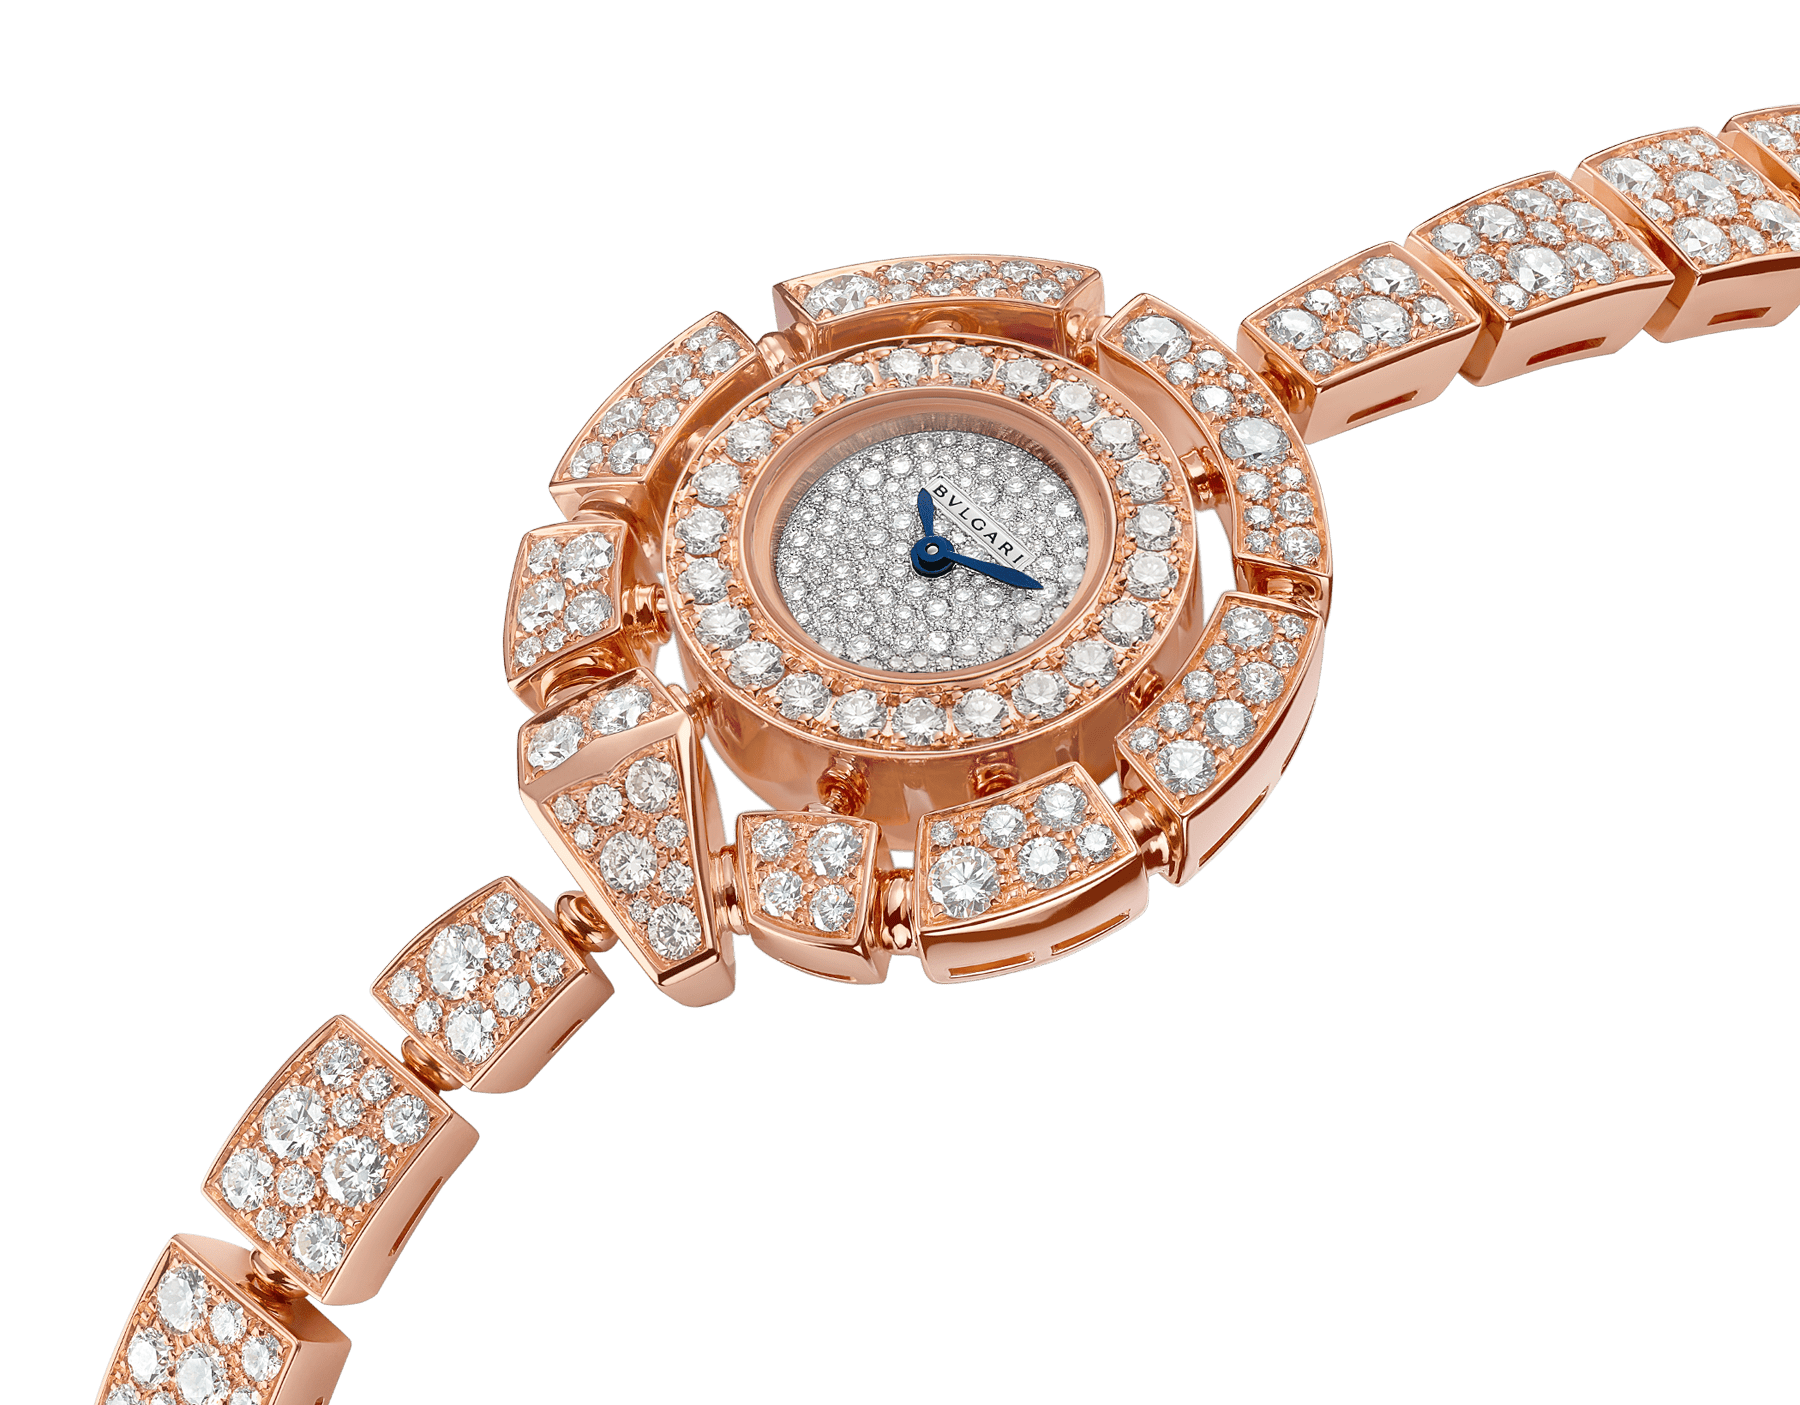 Serpenti Incantati 腕錶,18K 玫瑰金錶殼和錶帶鑲飾明亮型切割鑽石,雪花式密鑲鑽石錶盤。 102673 image 2